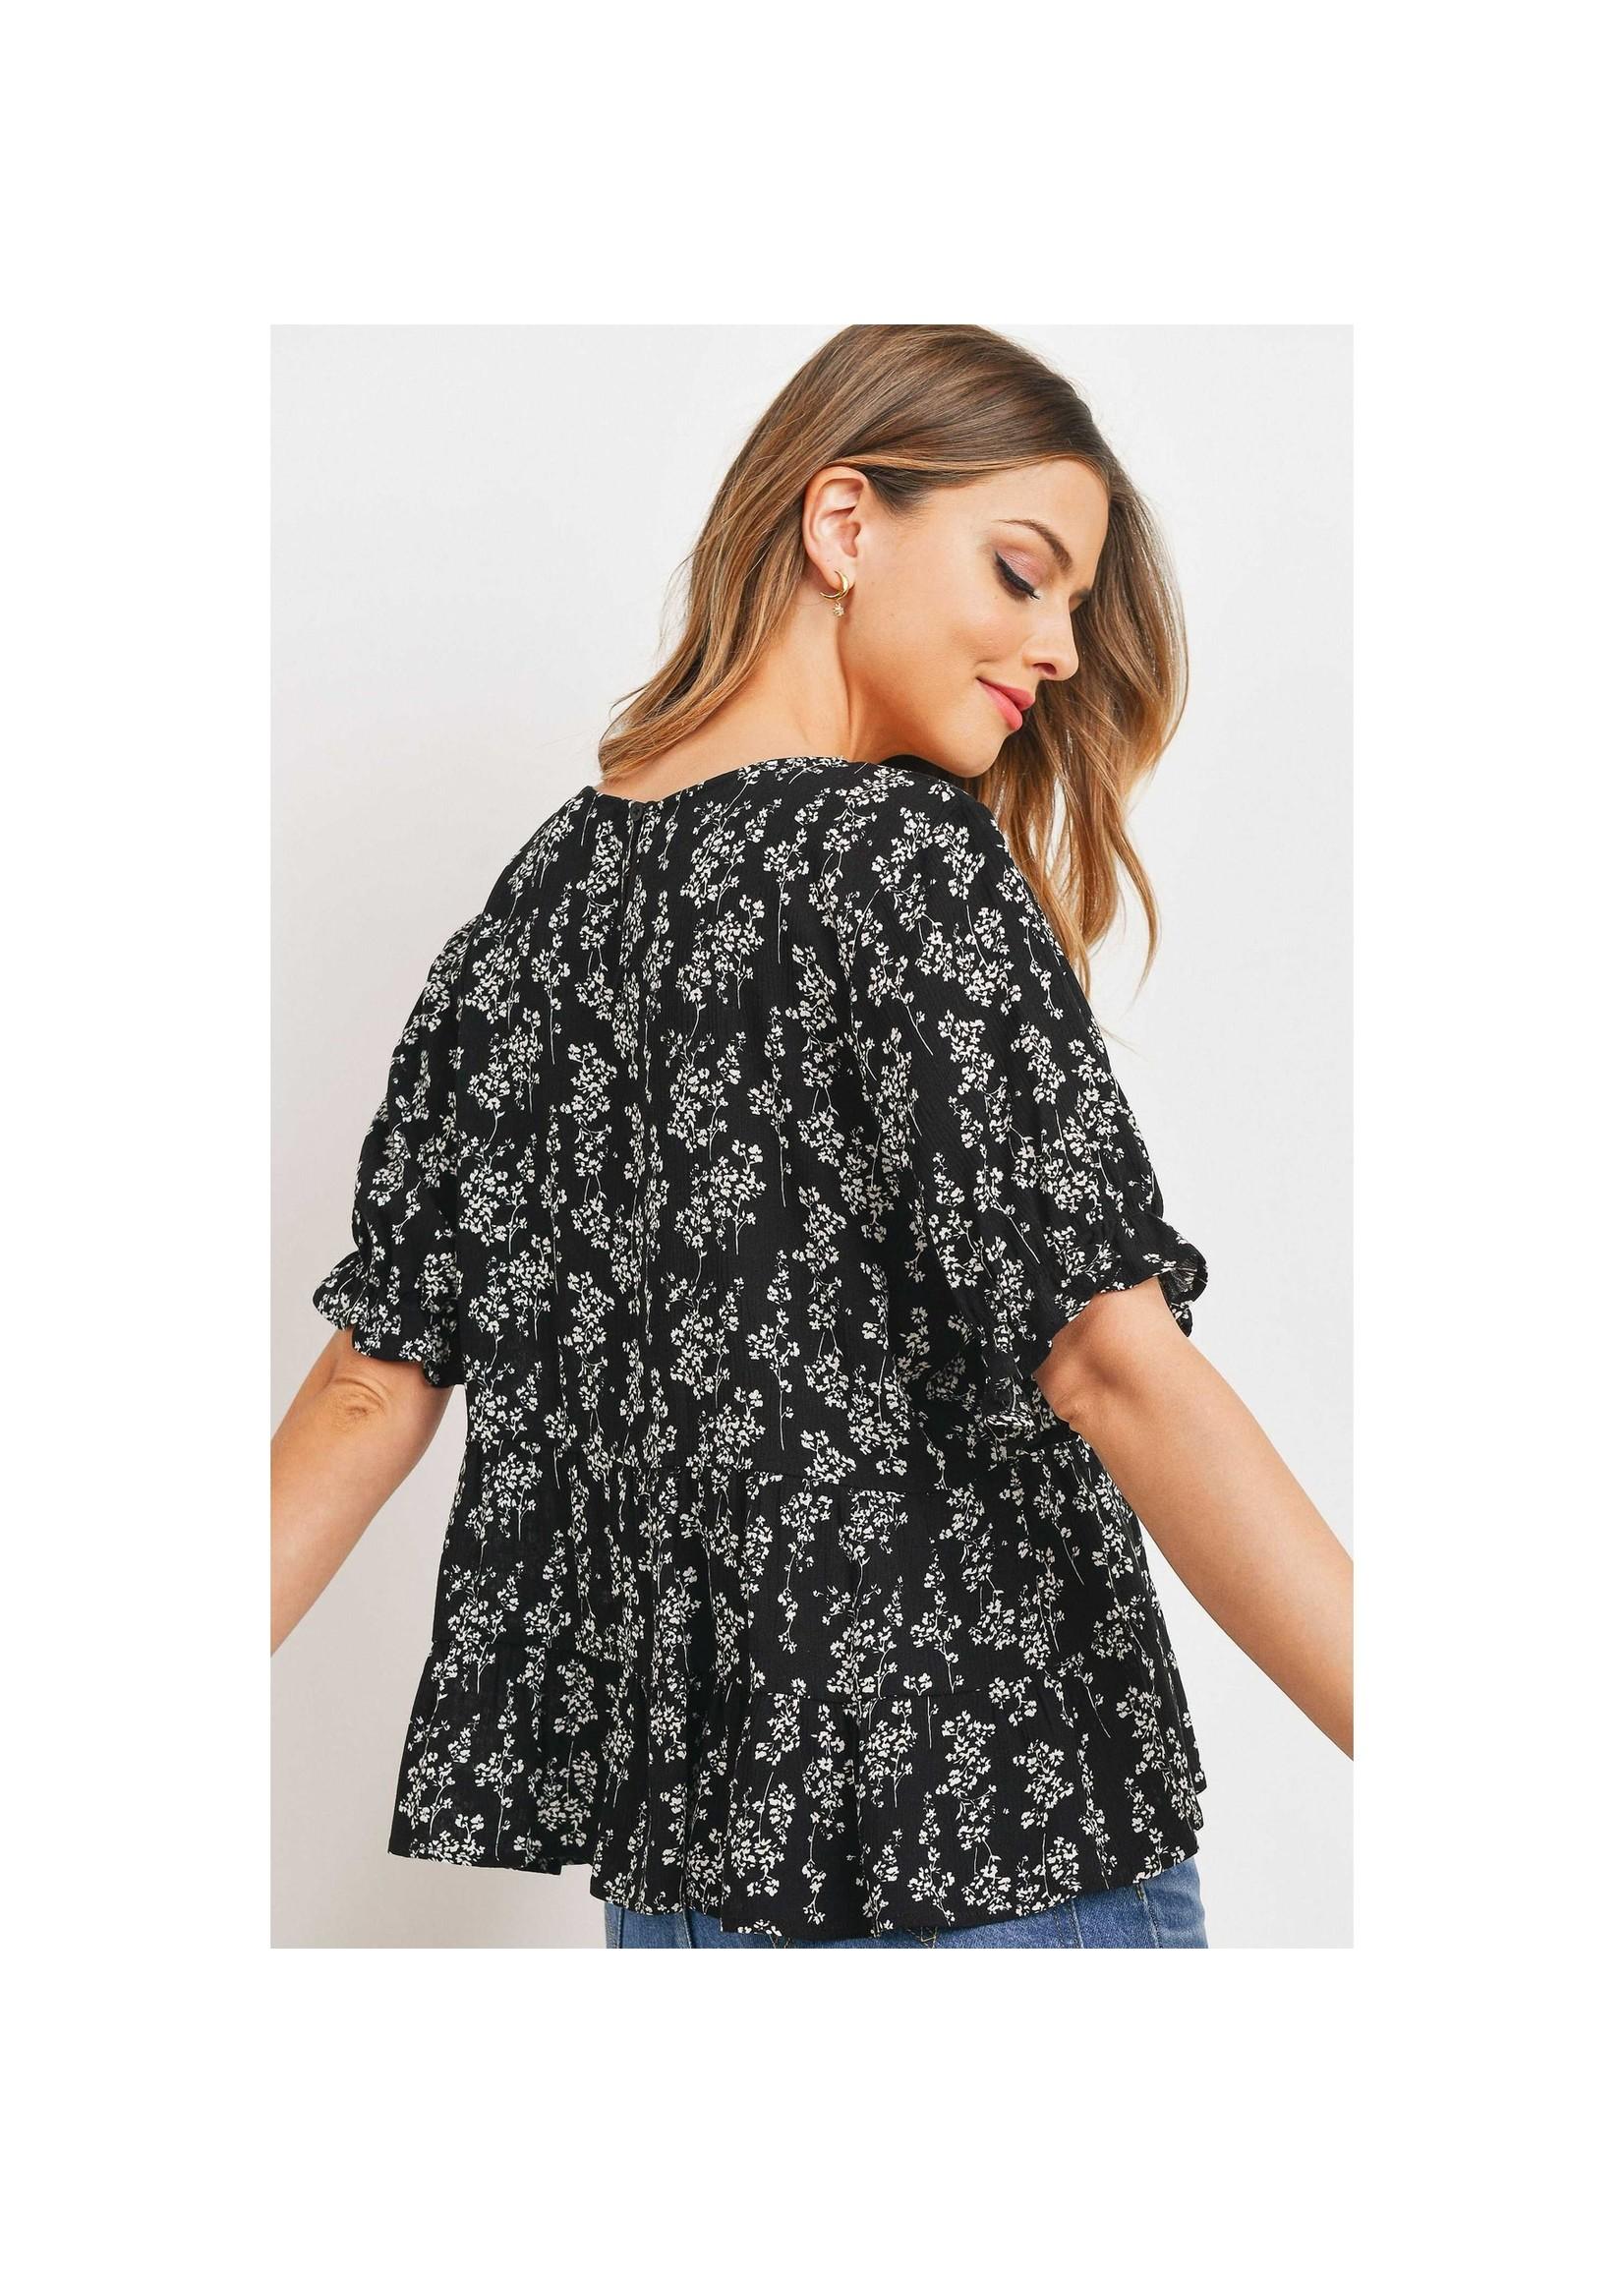 Paper Crane Black Floral Babydoll Top